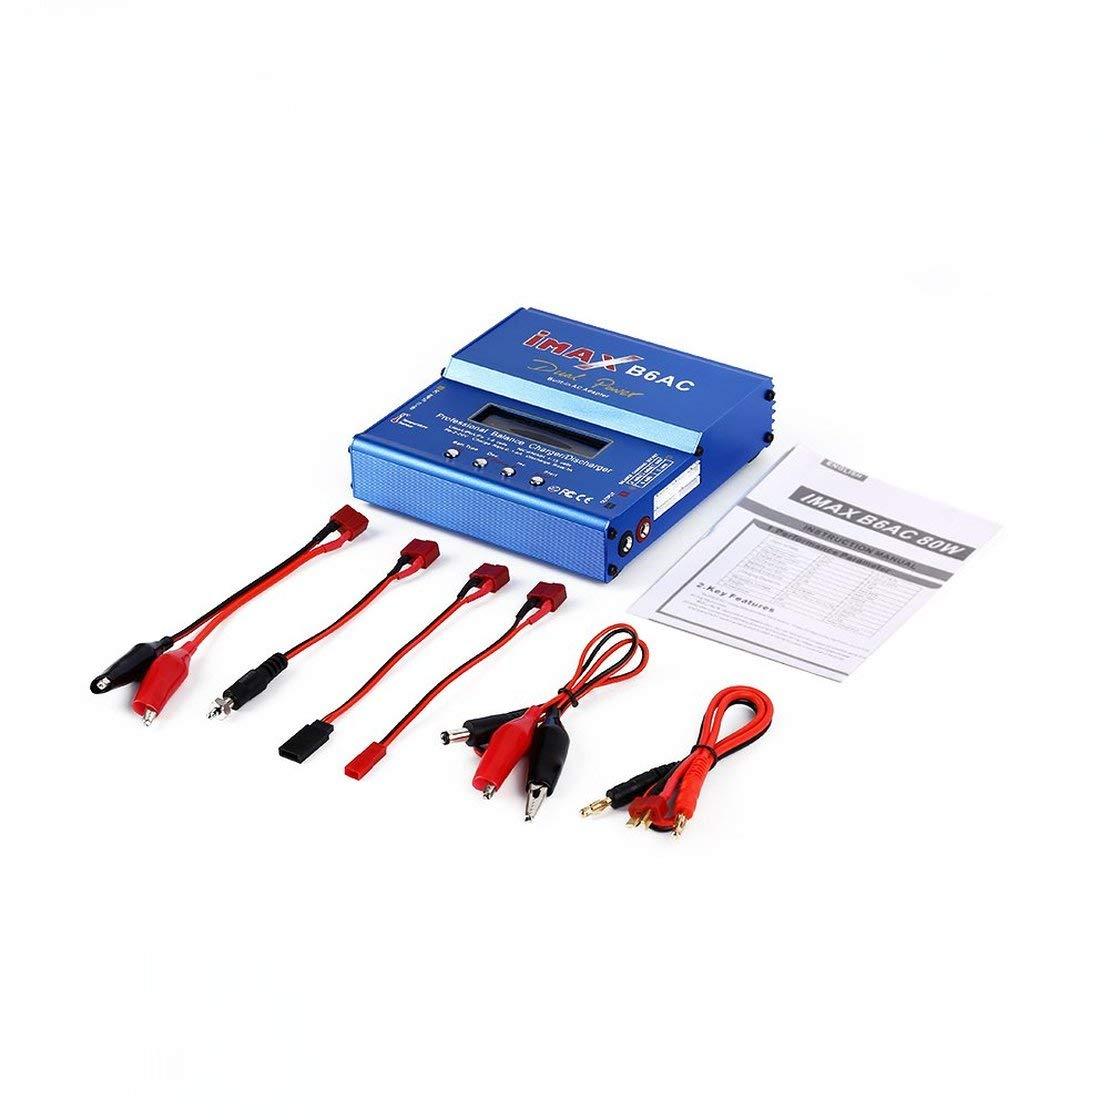 descargador de balanza Compacto Inteligente EE Laurelmartina Profesional iMAX B6AC Cargador UU Enchufe T Ranuras CA a Adaptador de CC